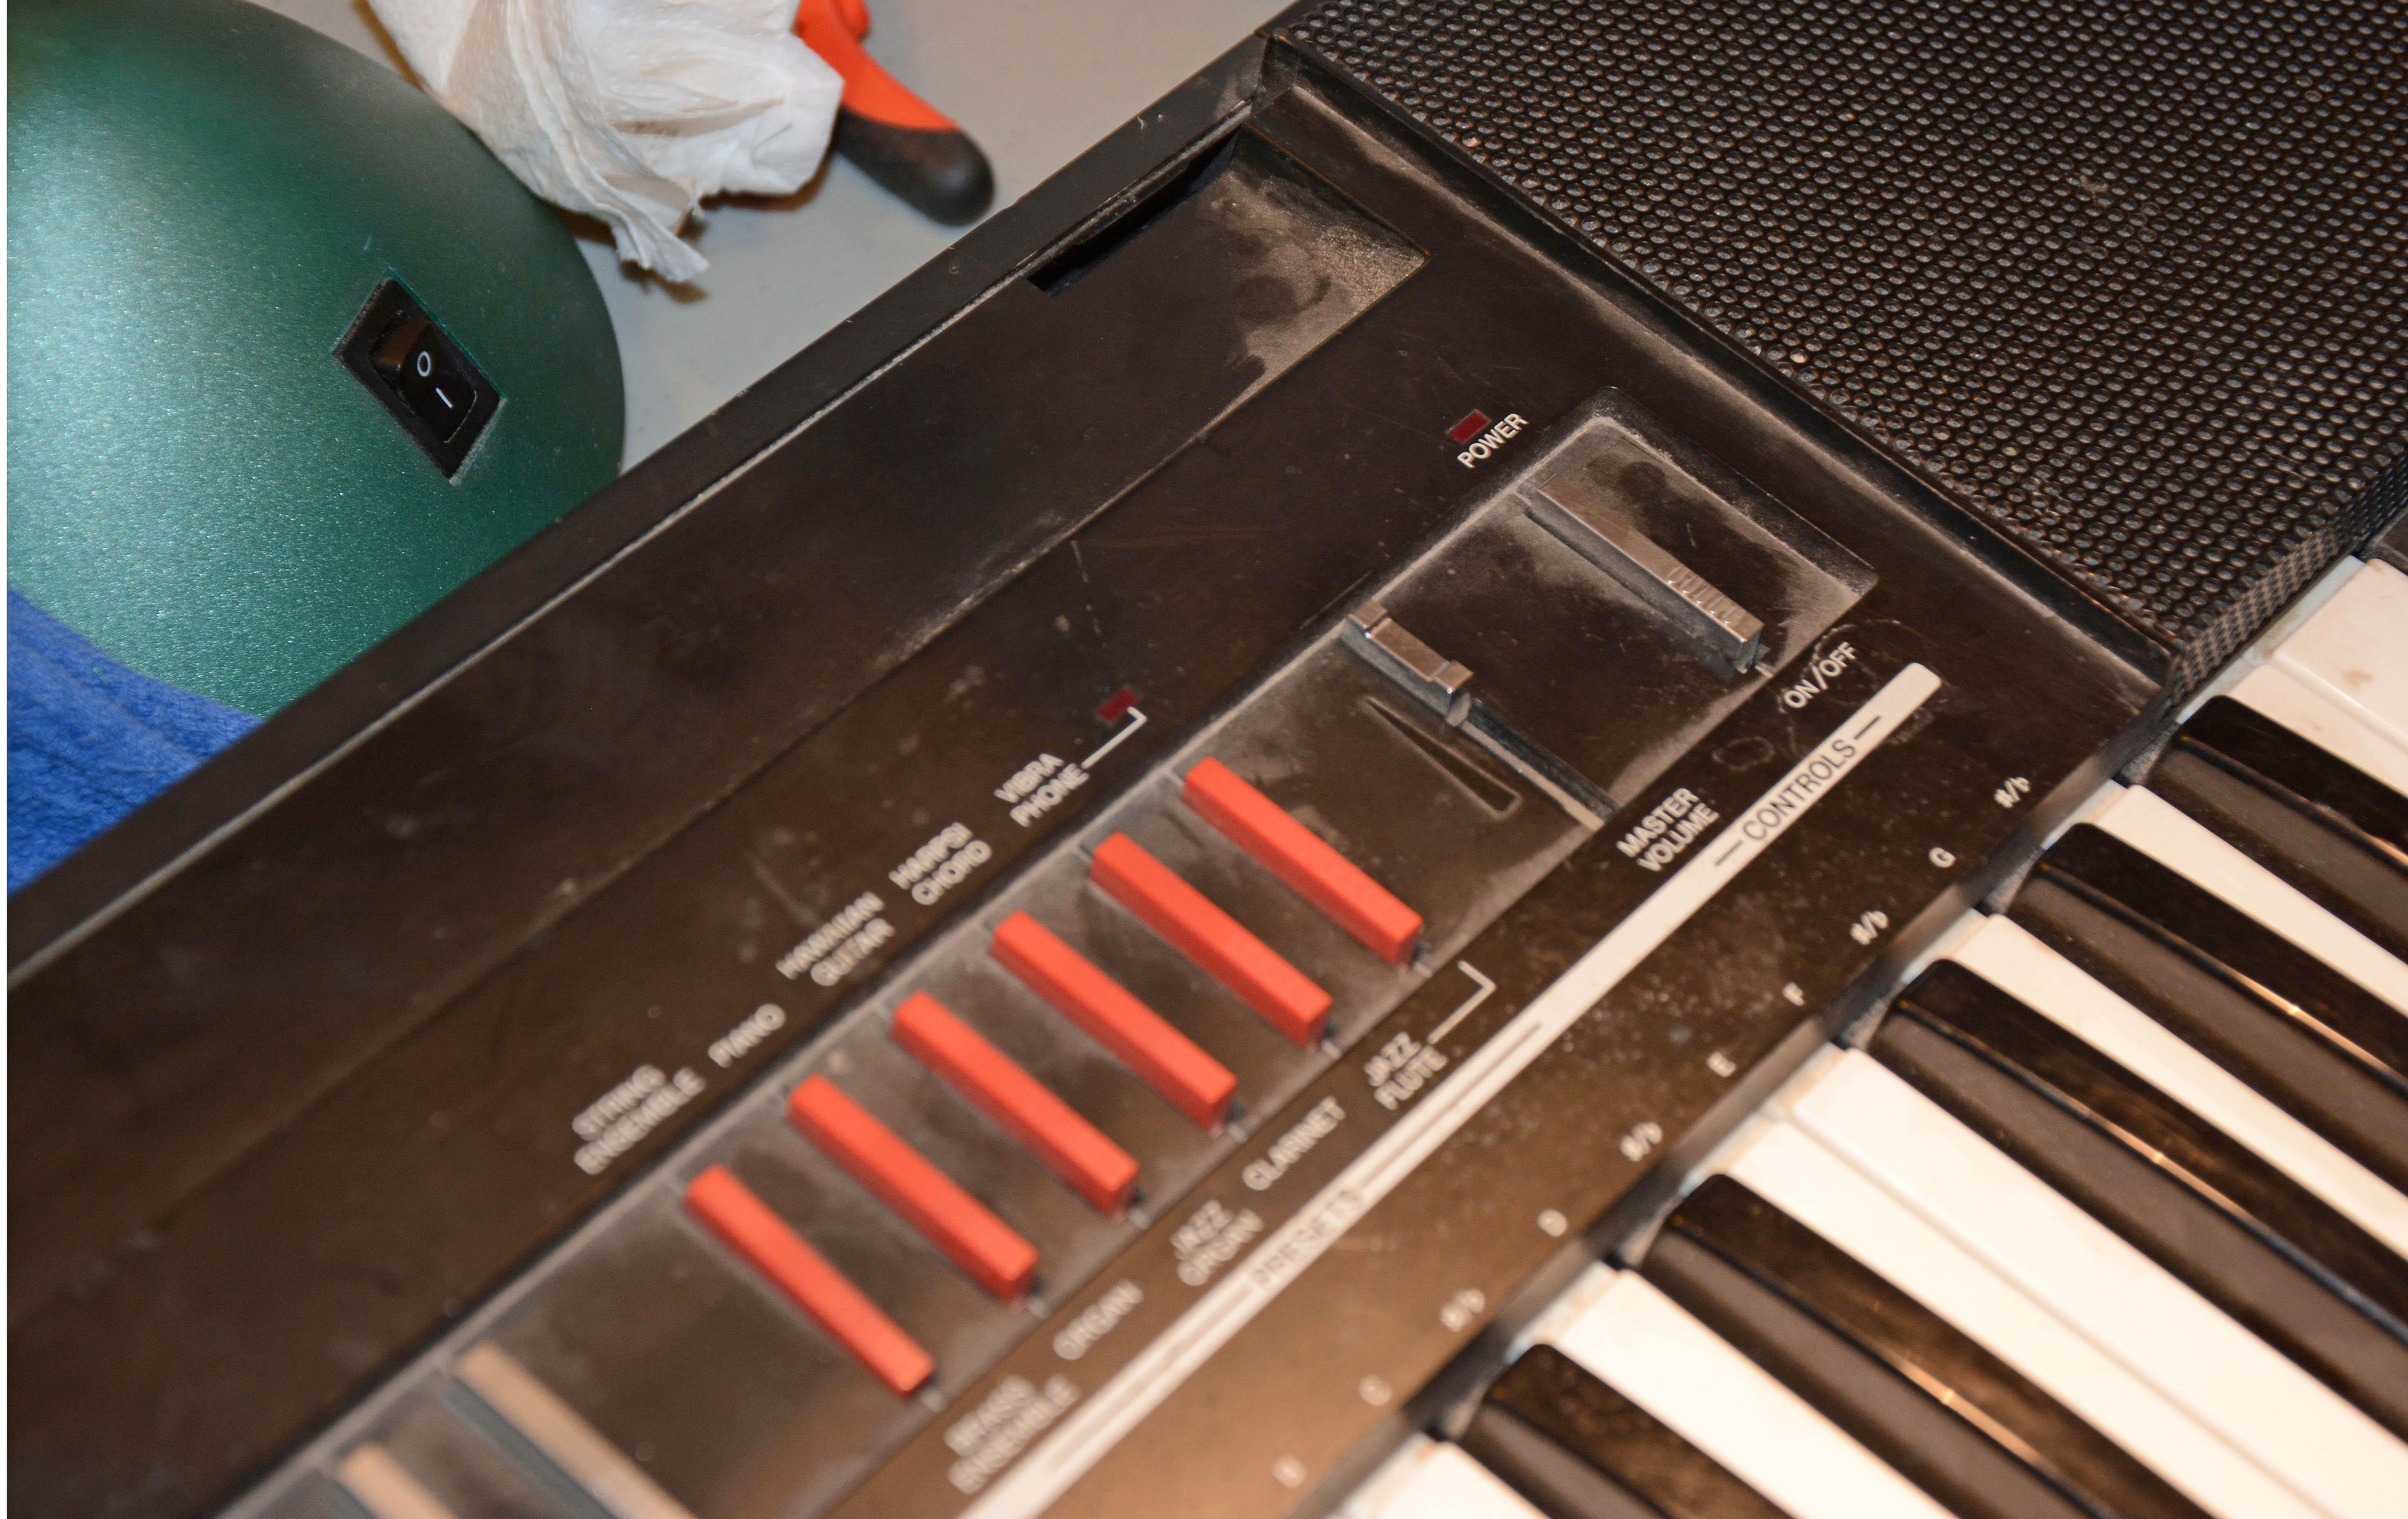 DC Adapter For Lowrey Micro Genie V-101 V-60 Lowery Keyboard Power Supply AC